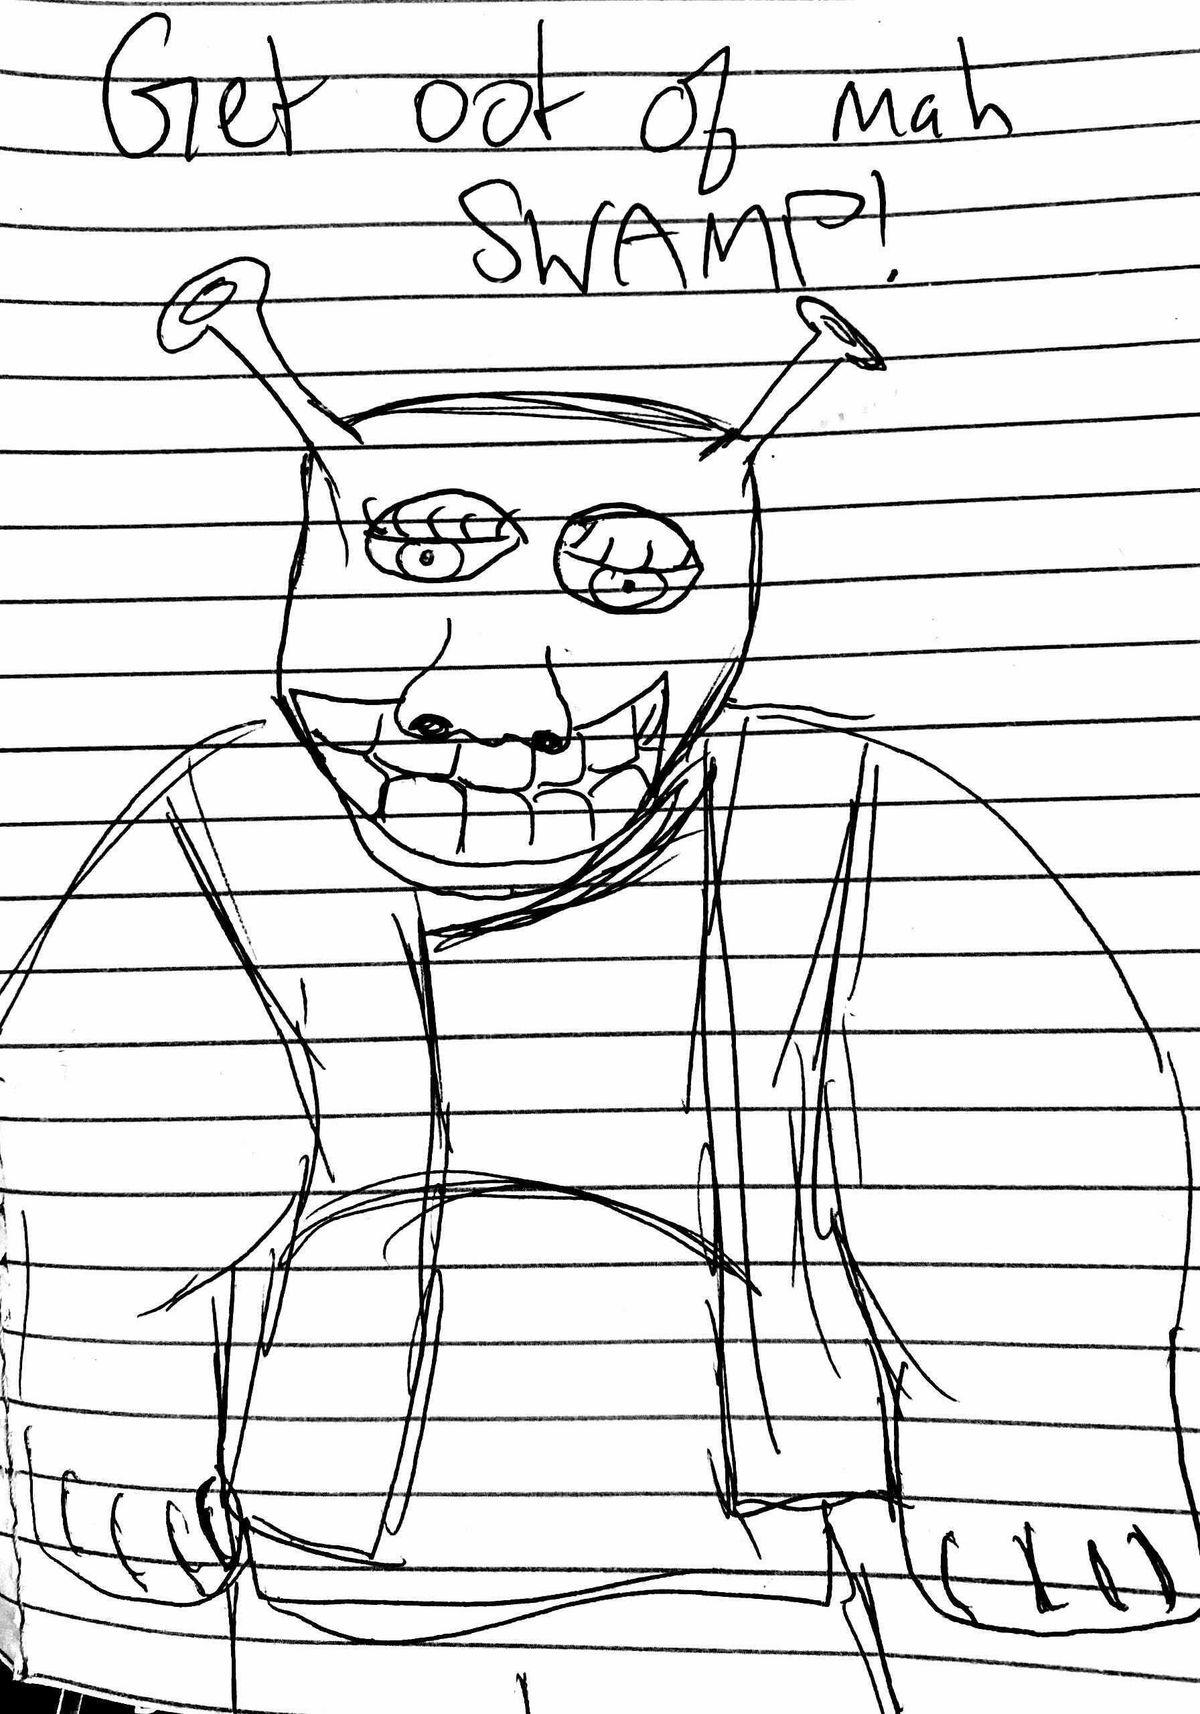 a sketch of shrek